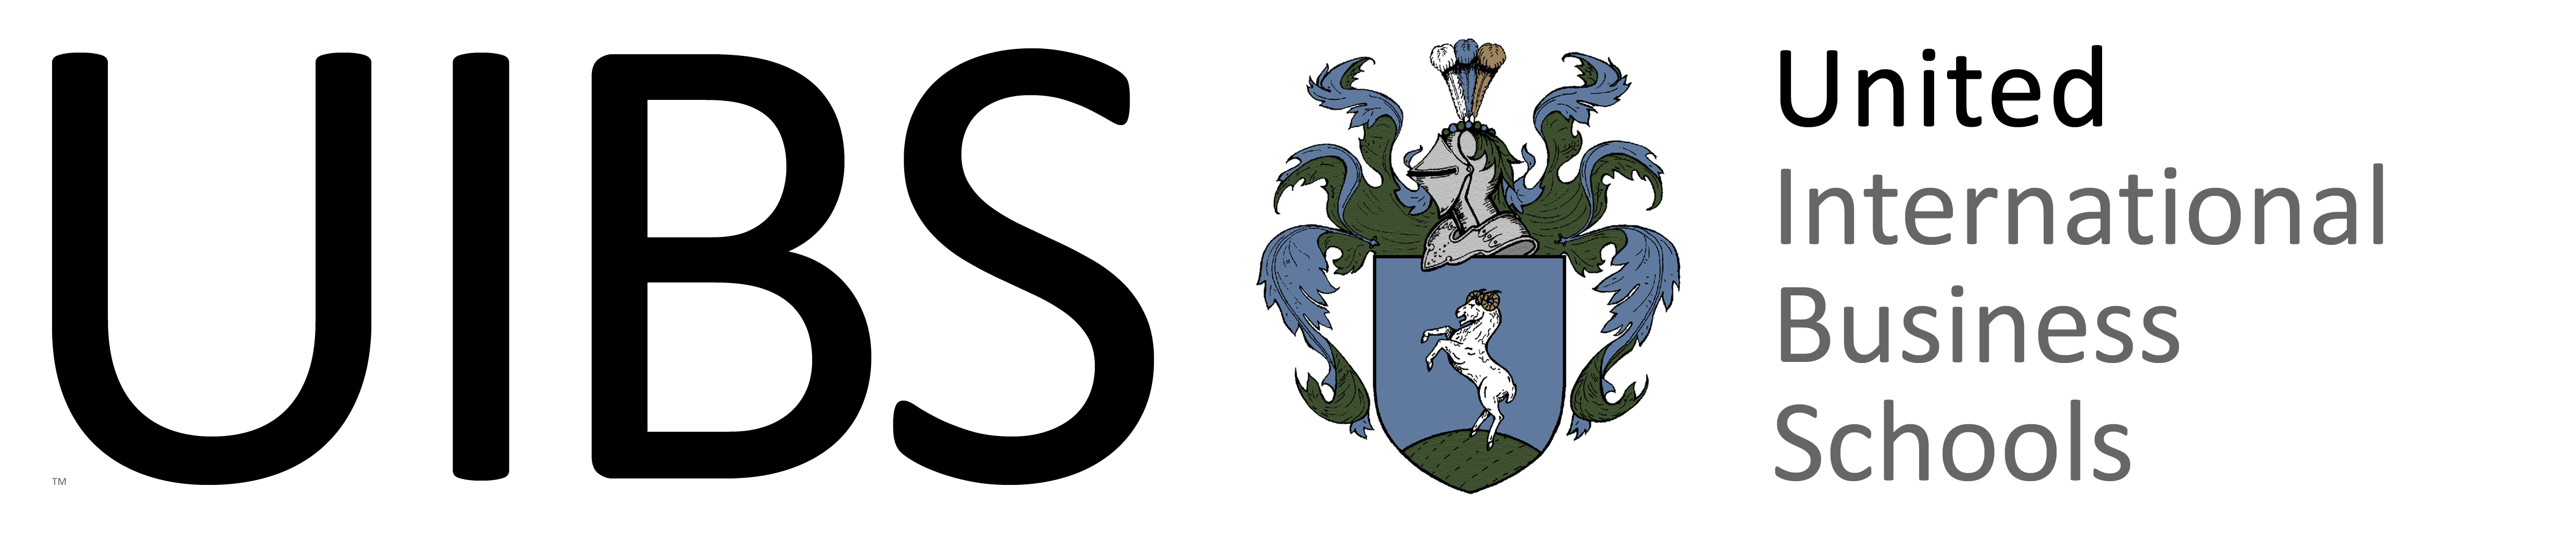 UIBS logo